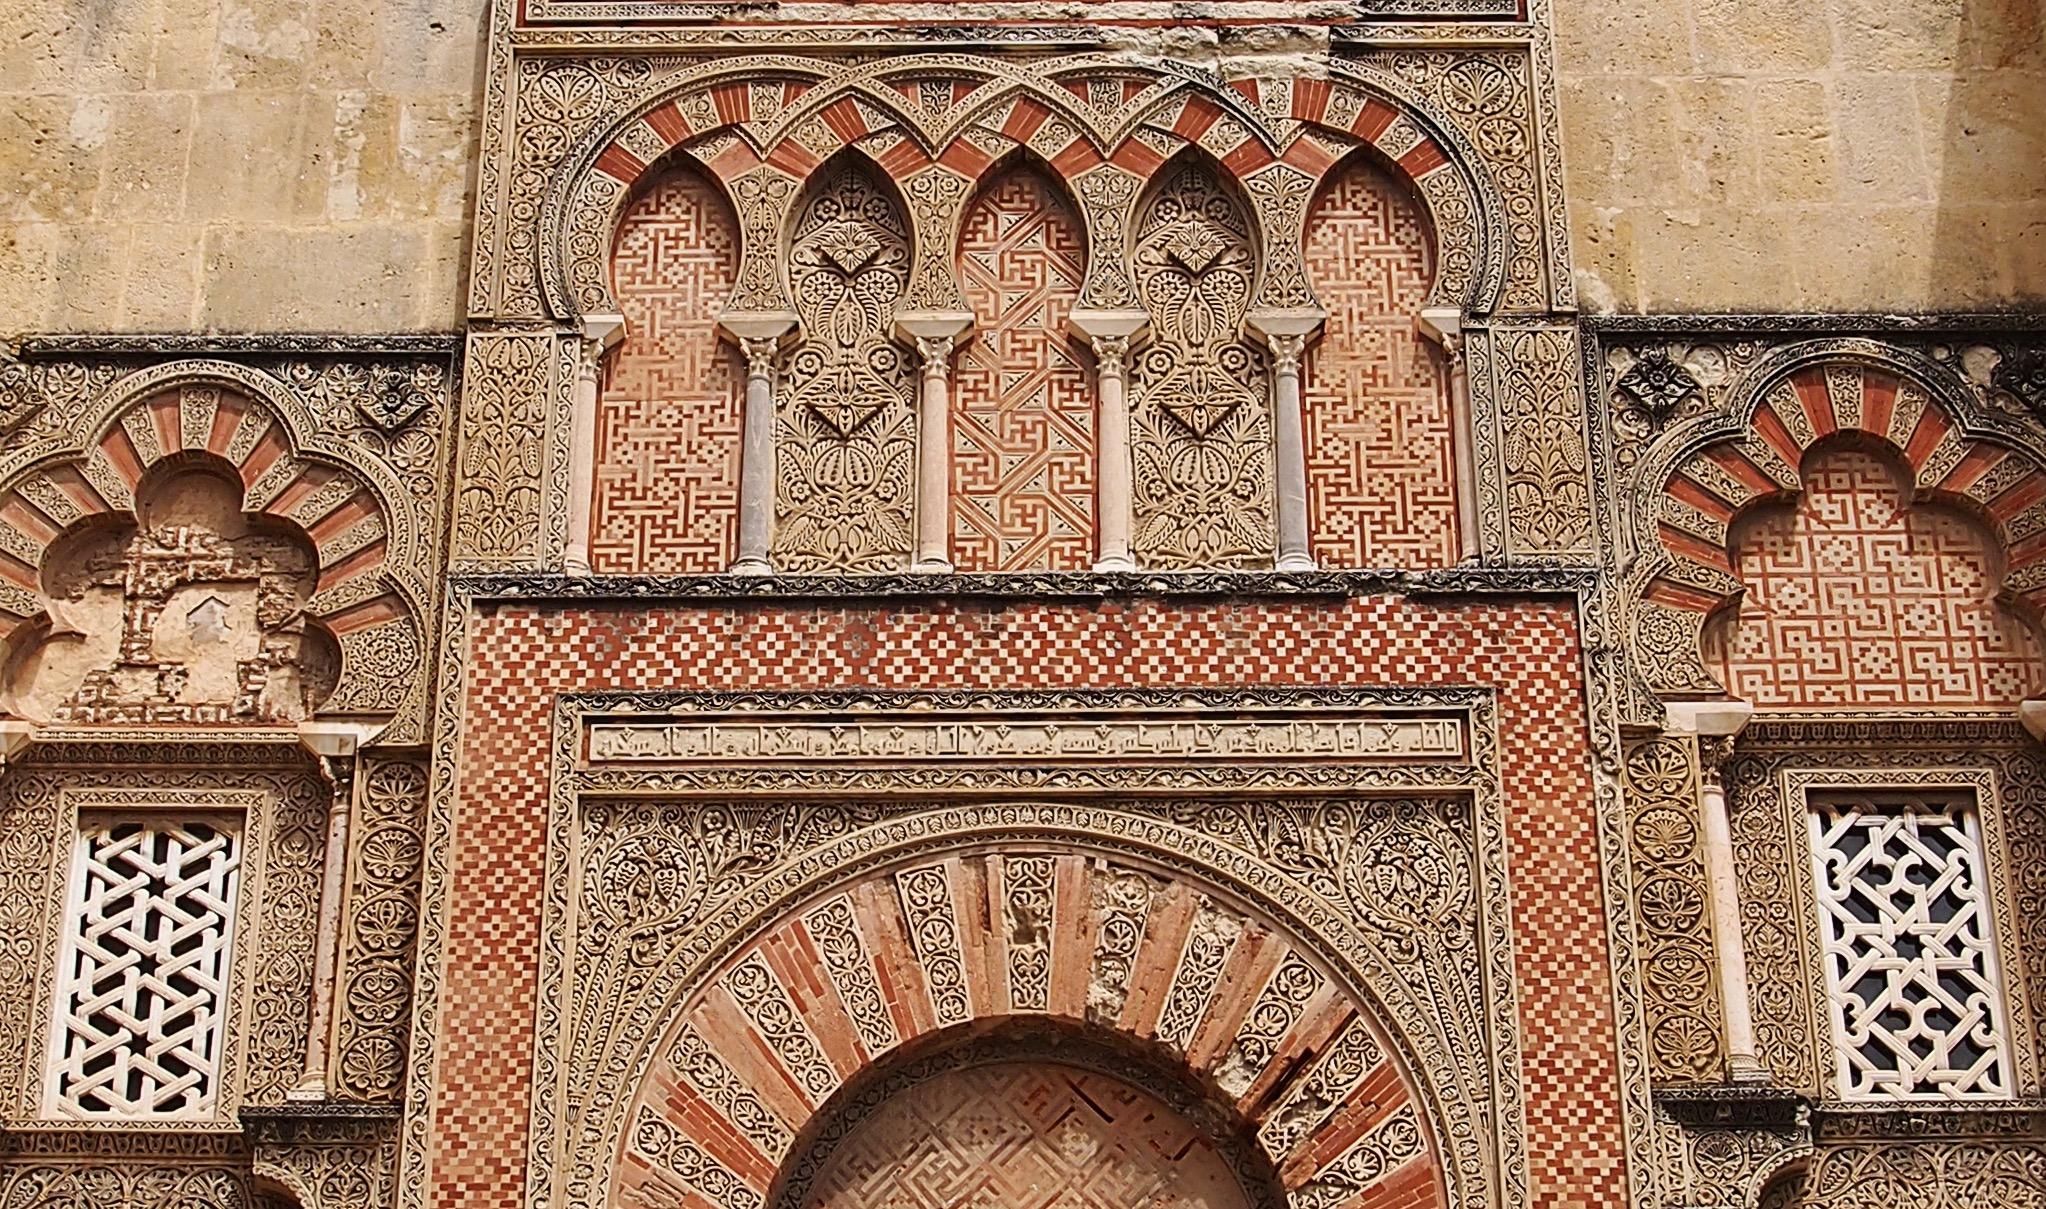 file córdoba spain mezquita de córdoba cathedral of our lady of